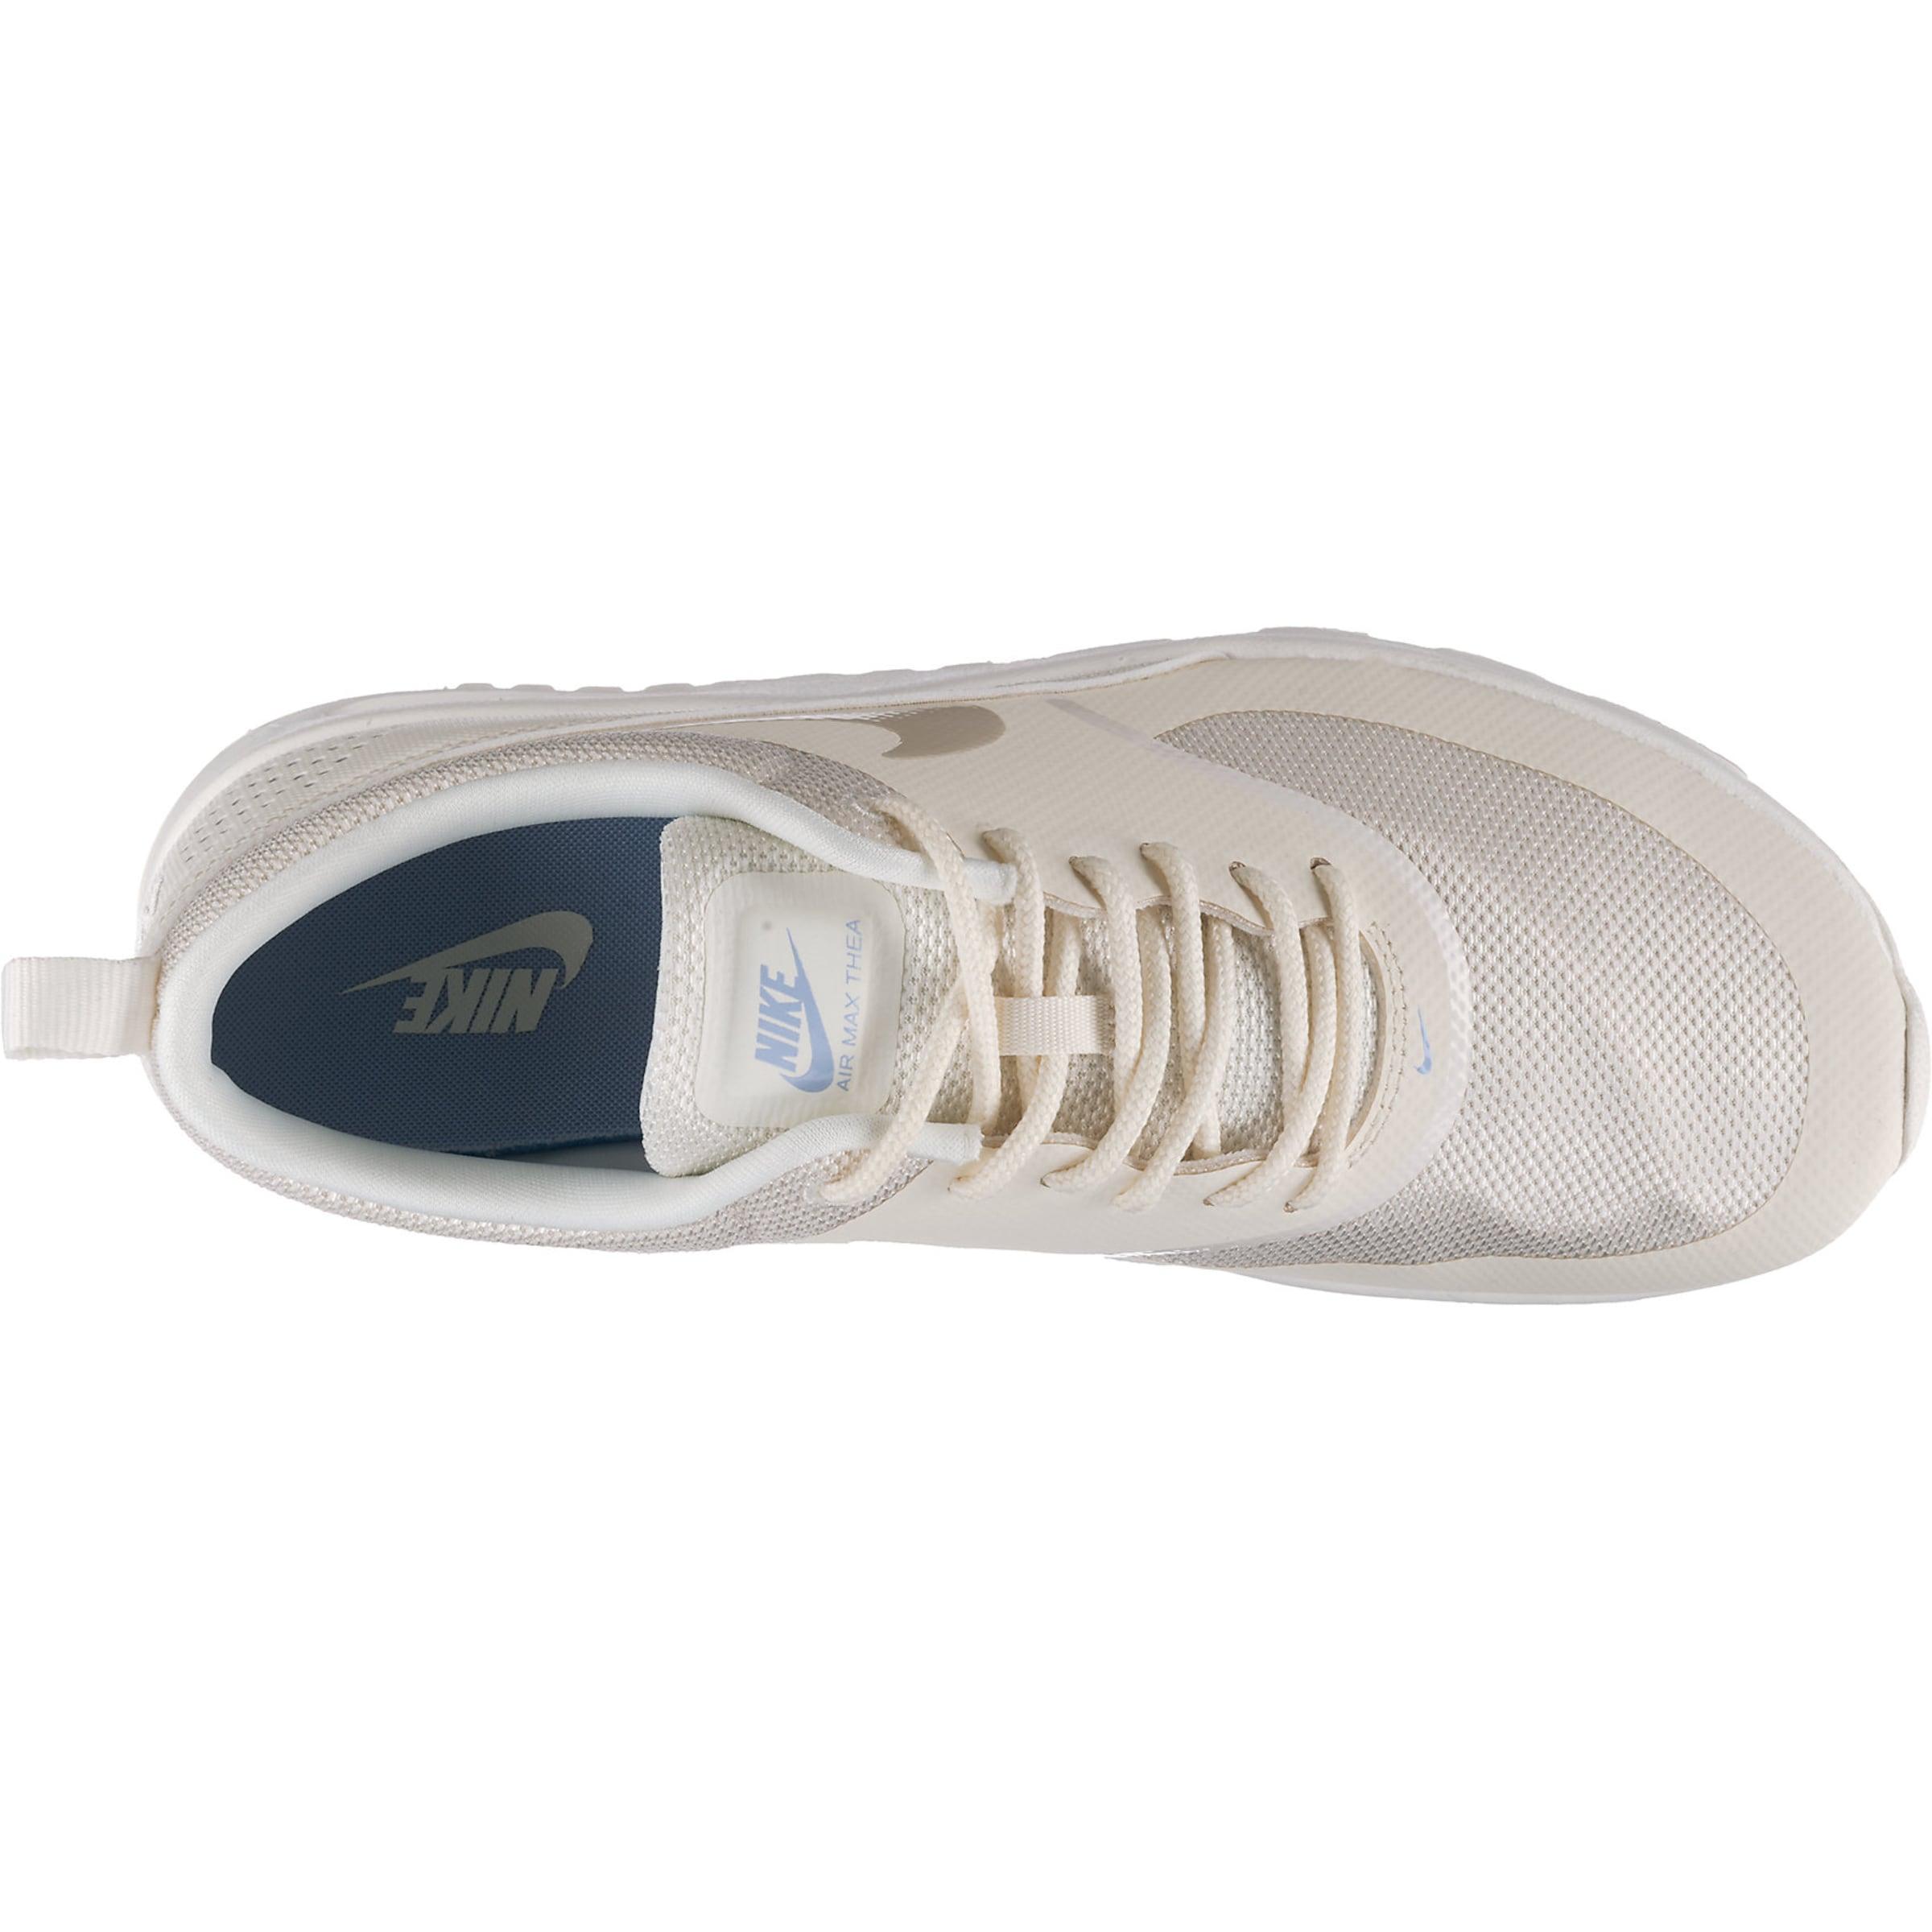 Nike Nike Nike Sportswear Turnschuhe 'Air Max Thea Synthetik, Textil Billige Herren- und Damenschuhe 521a35